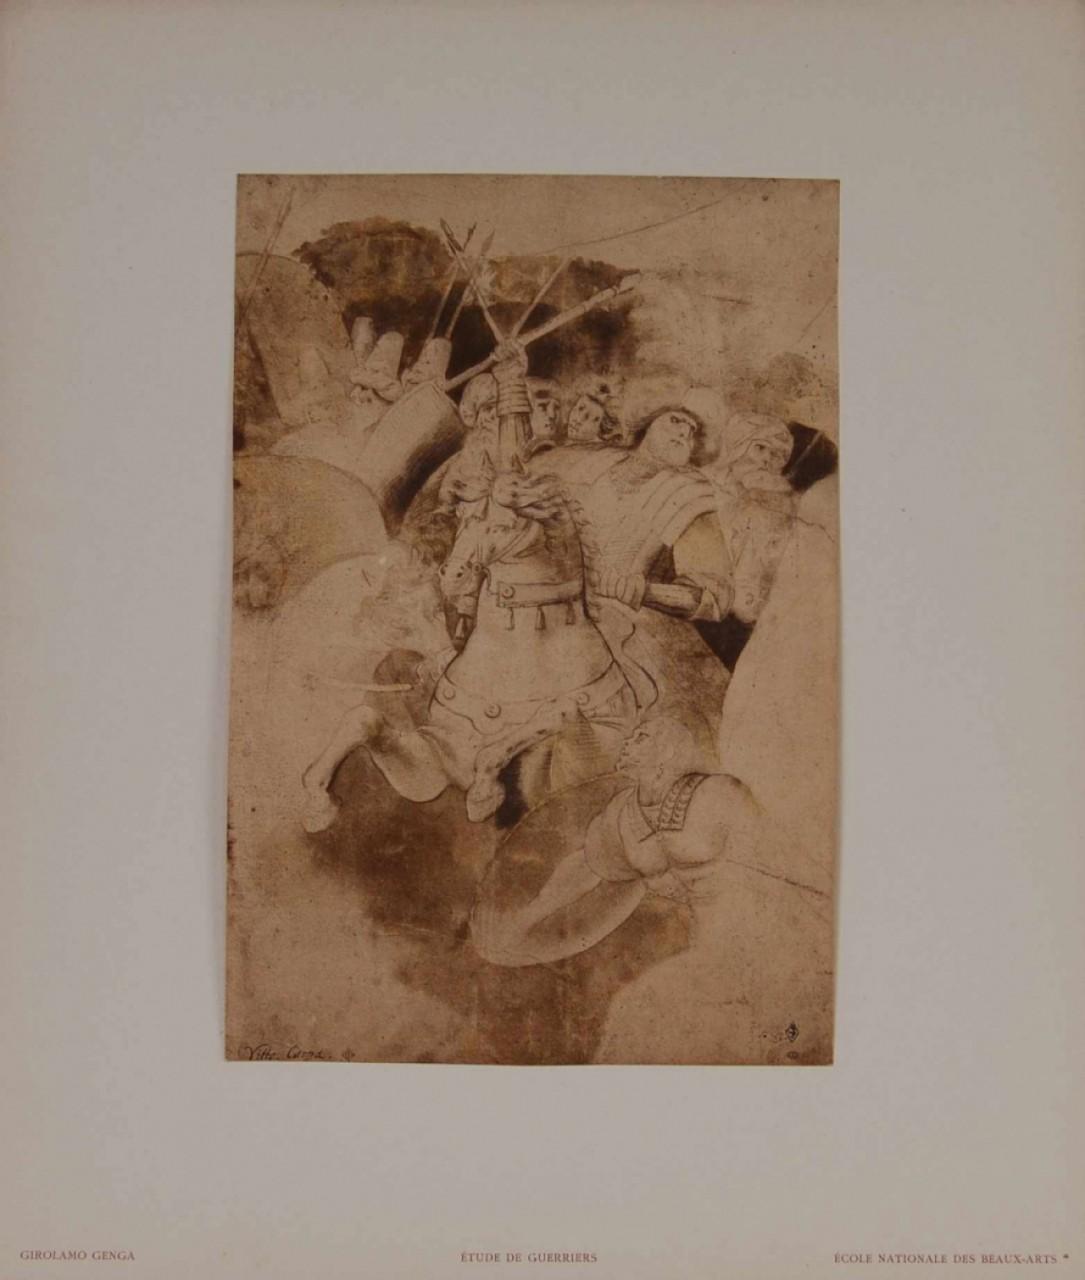 GIROLAMO Genga étude de guerriers